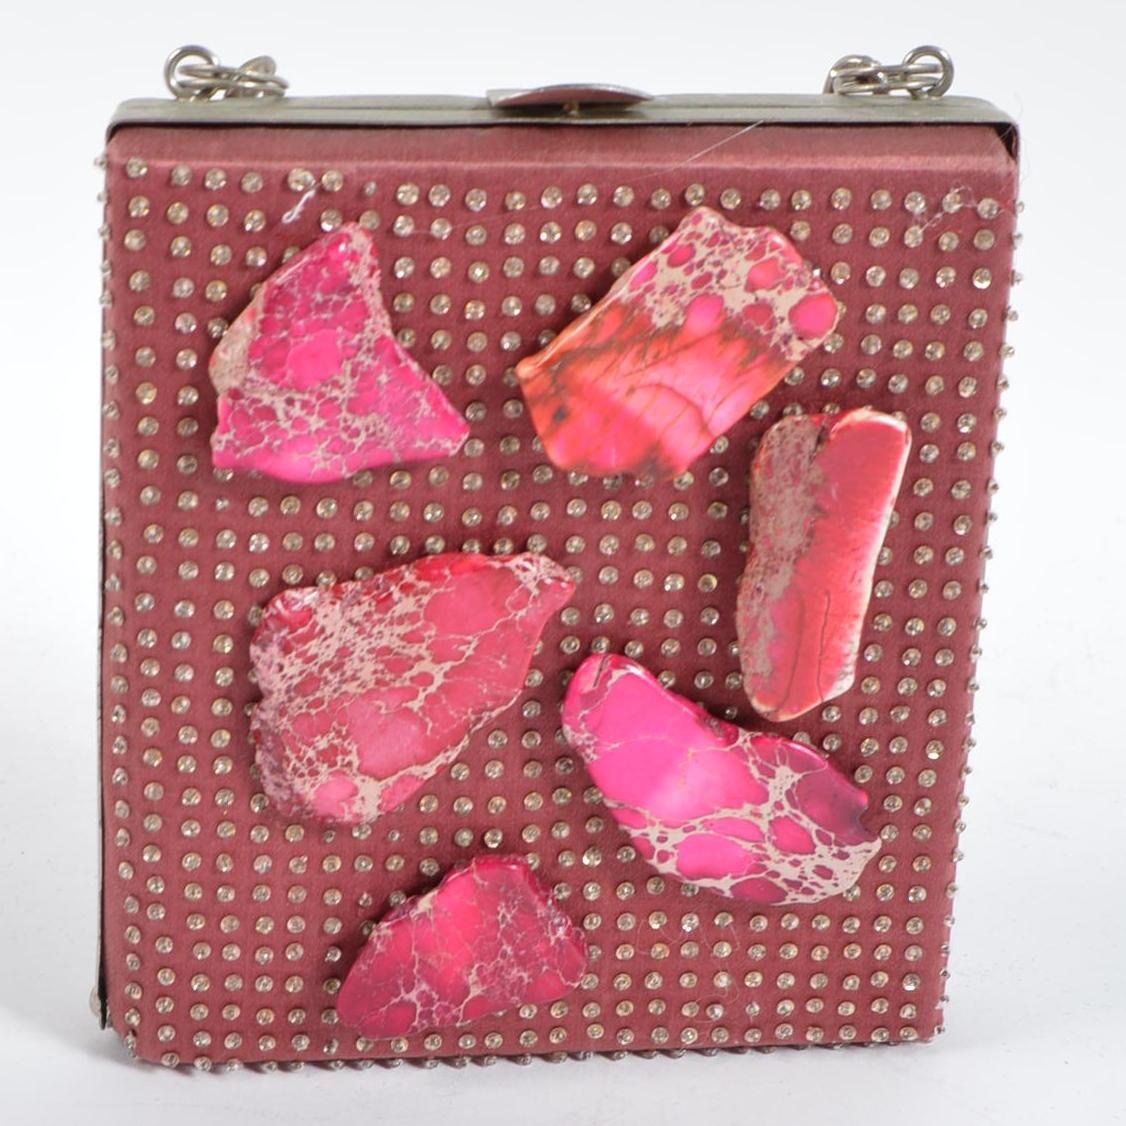 Vintage Megan Park Seed Beaded Evening Bag with Agate Embellishments